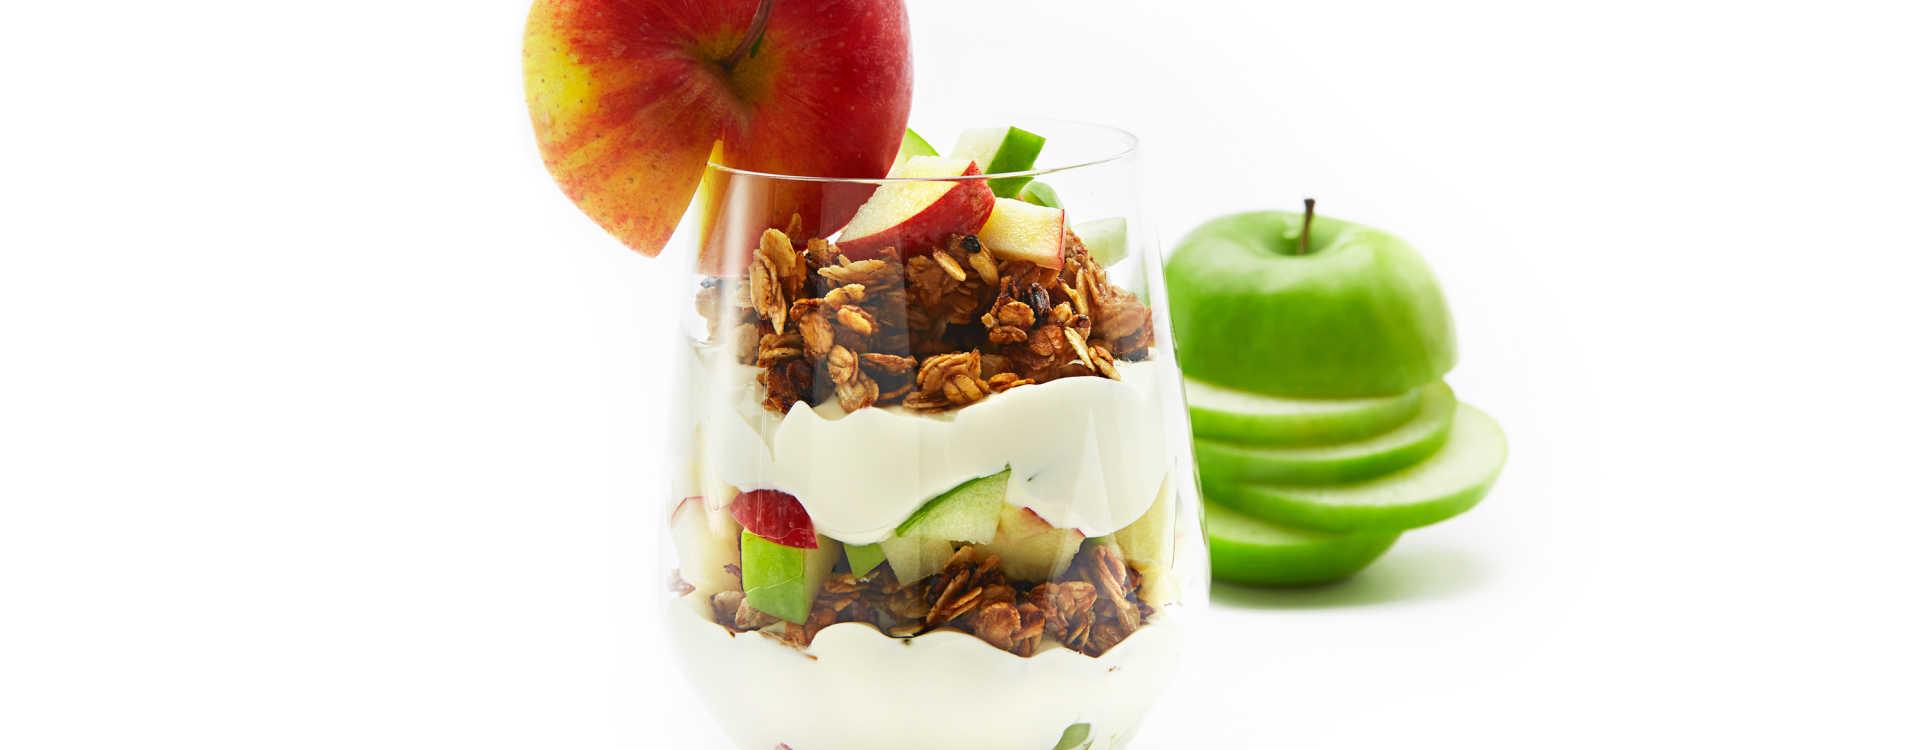 Tilslørte bondepiker med epler, havregryn og honning